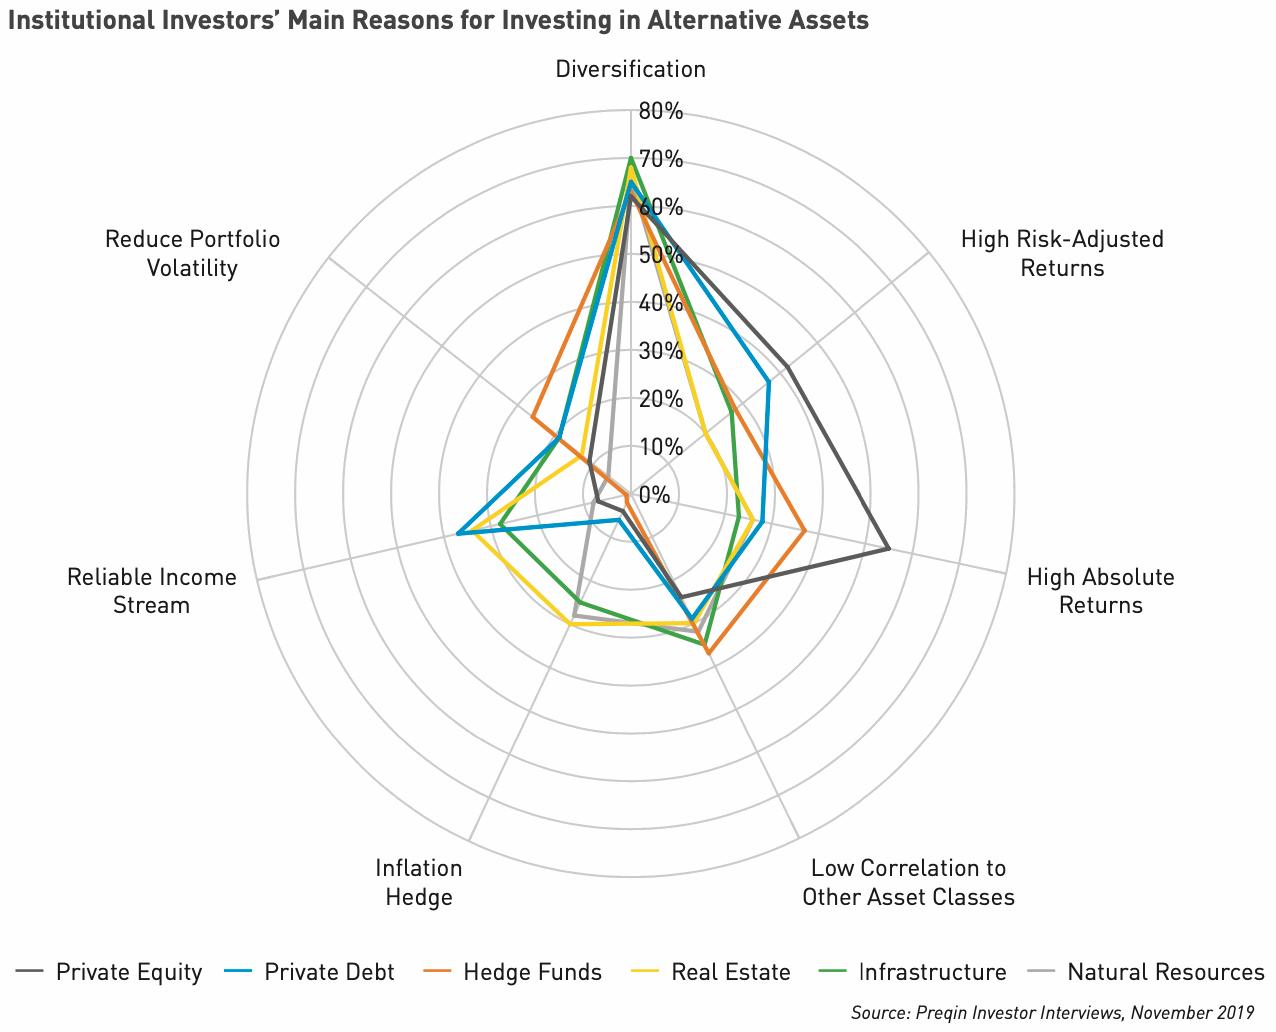 alternative-investing-motivations-diversification